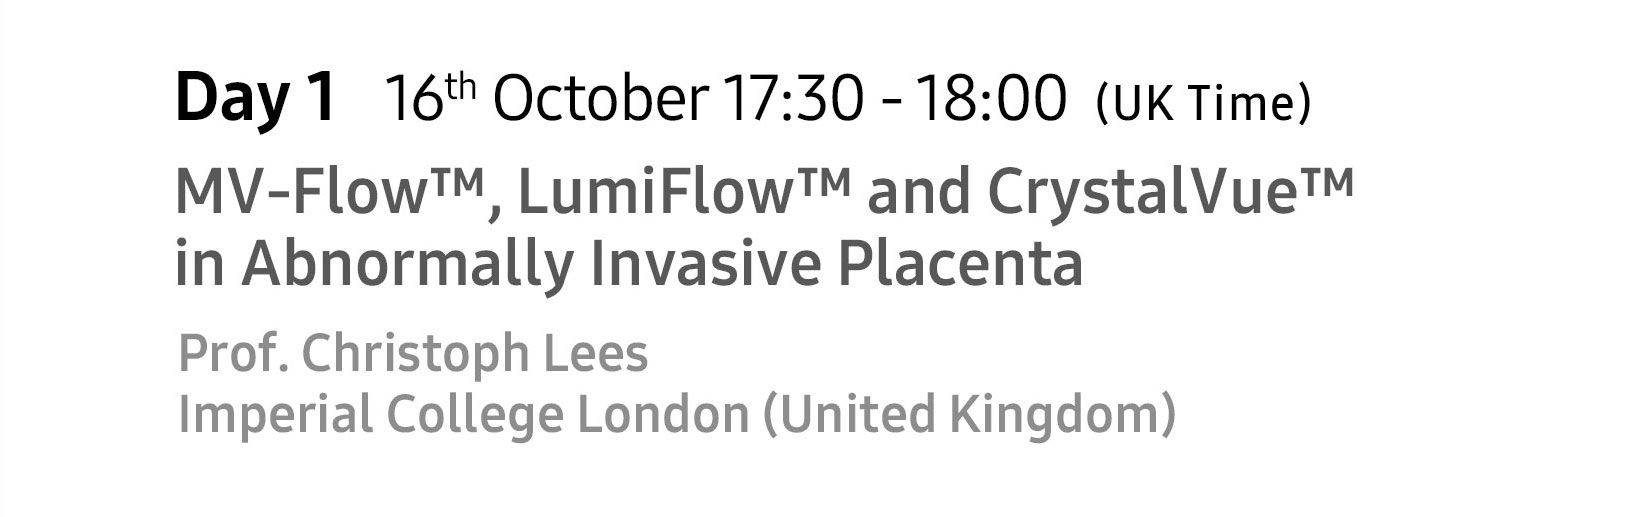 ISUOG 2020 London MV-Flow, LumiFlow, CrystalVue - Prof. Christoph Lees